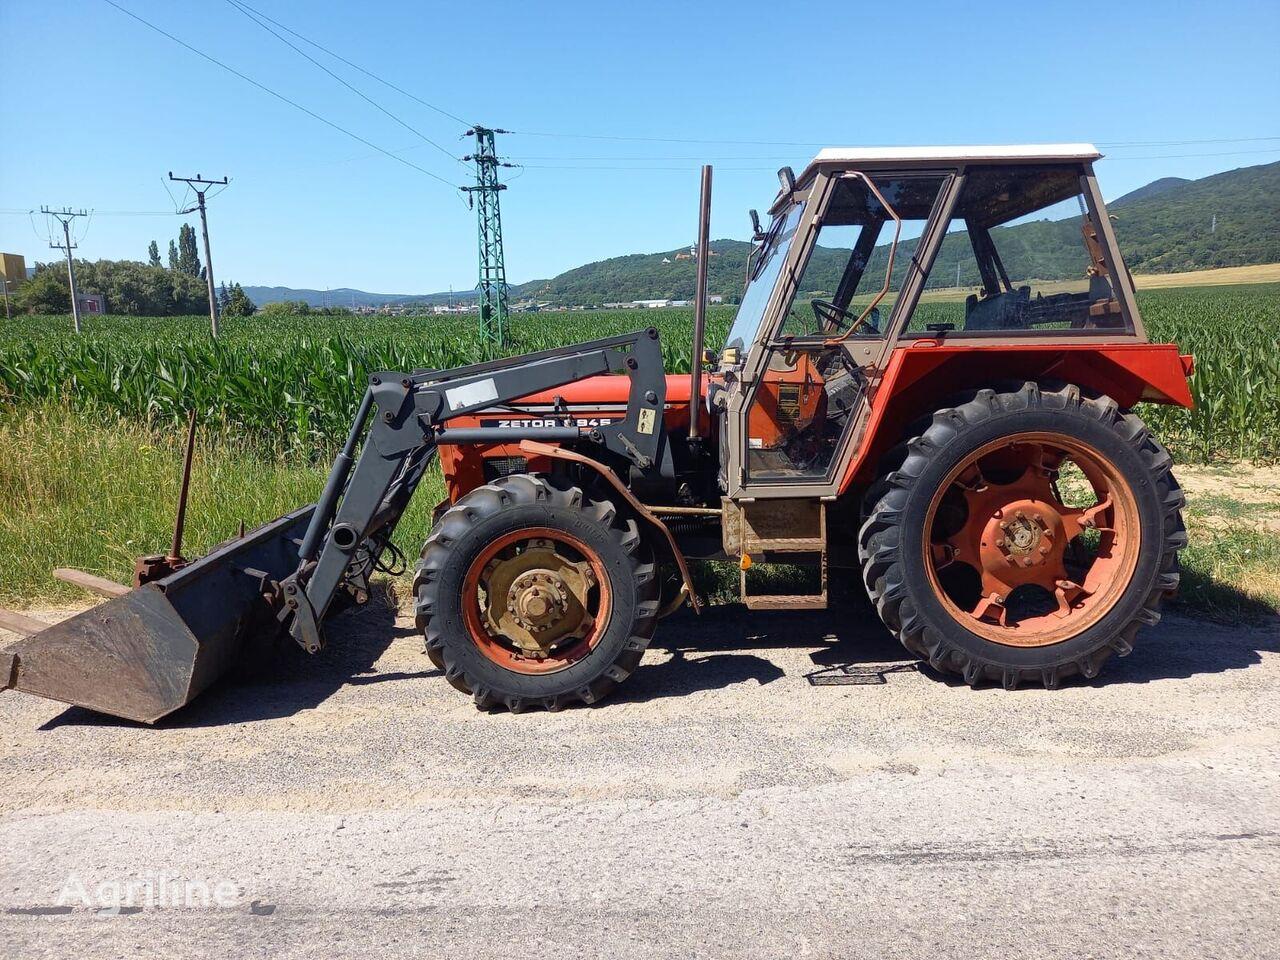 трактор колесный ZETOR 6945 4x4 front loader bucket 43kw